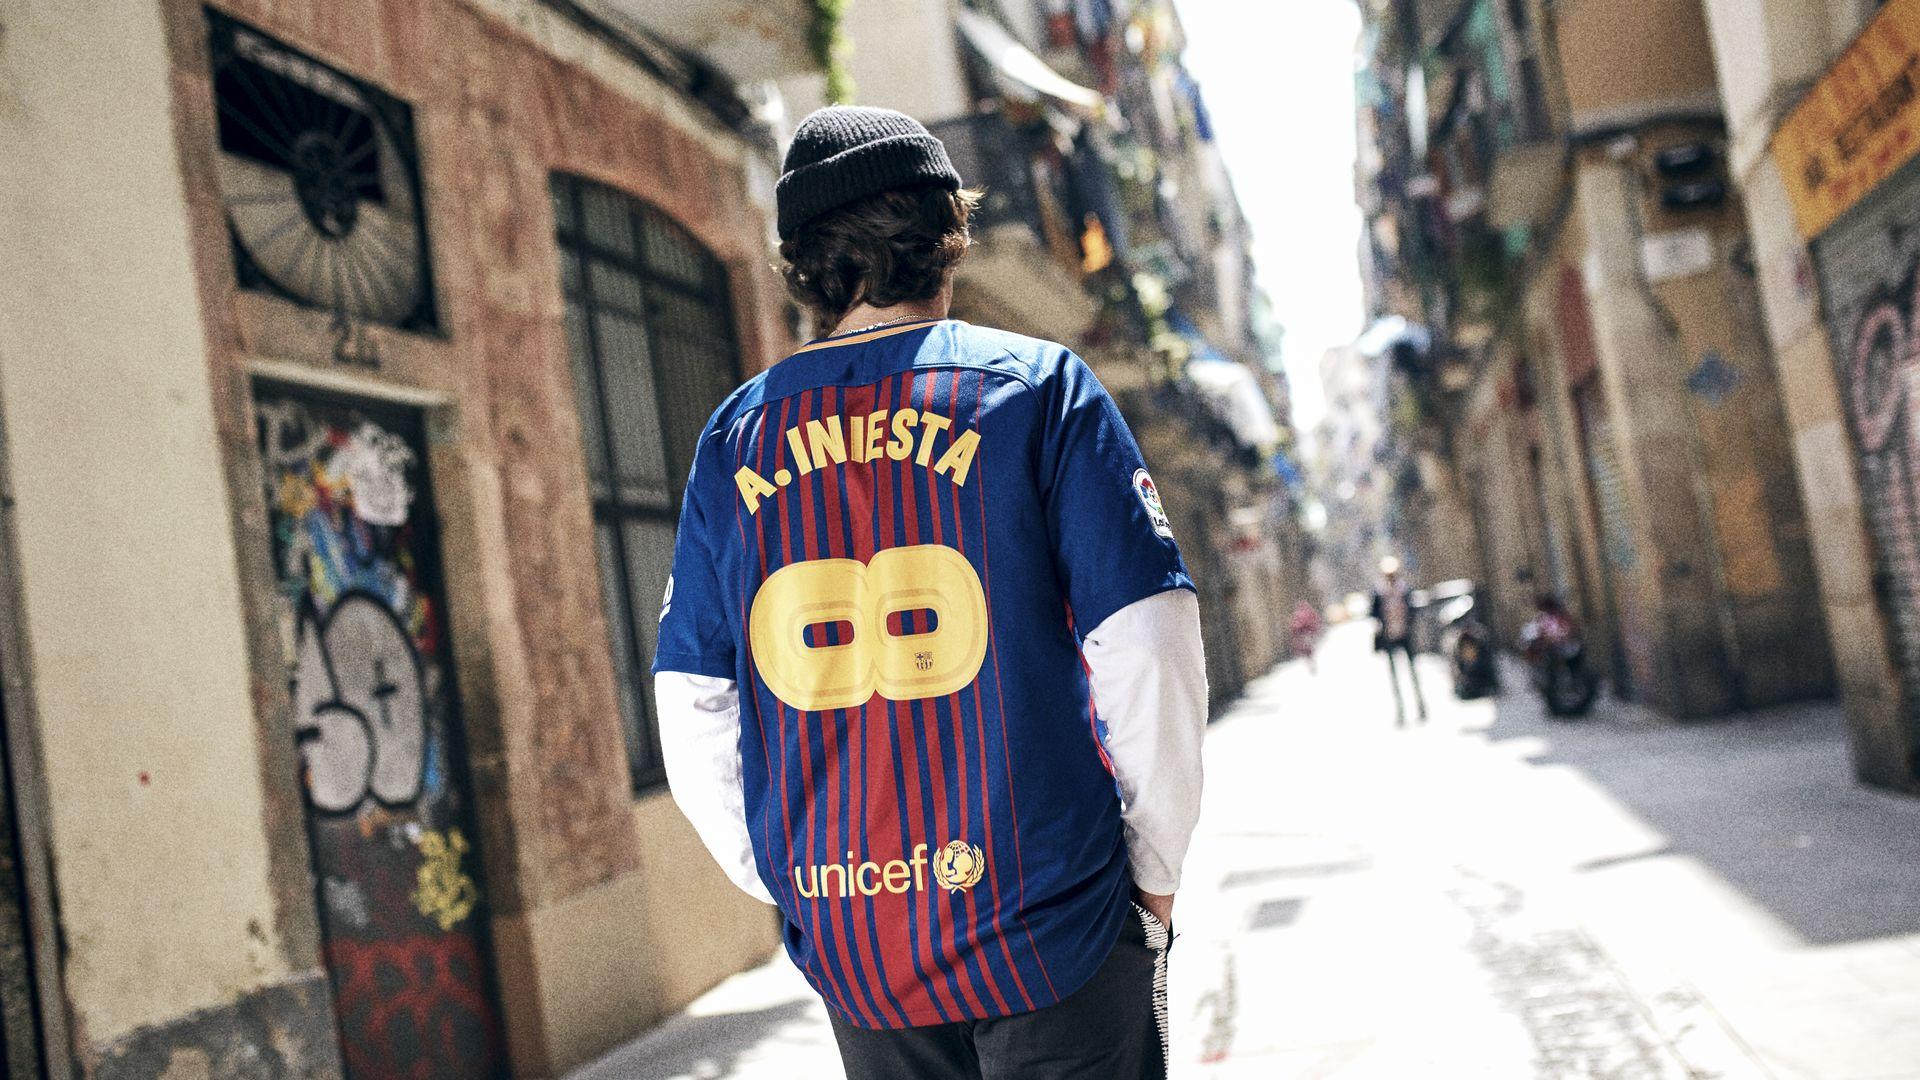 b7b498194 2017 18 FC Barcelona Stadium Home Kit. INFINIT INIESTA